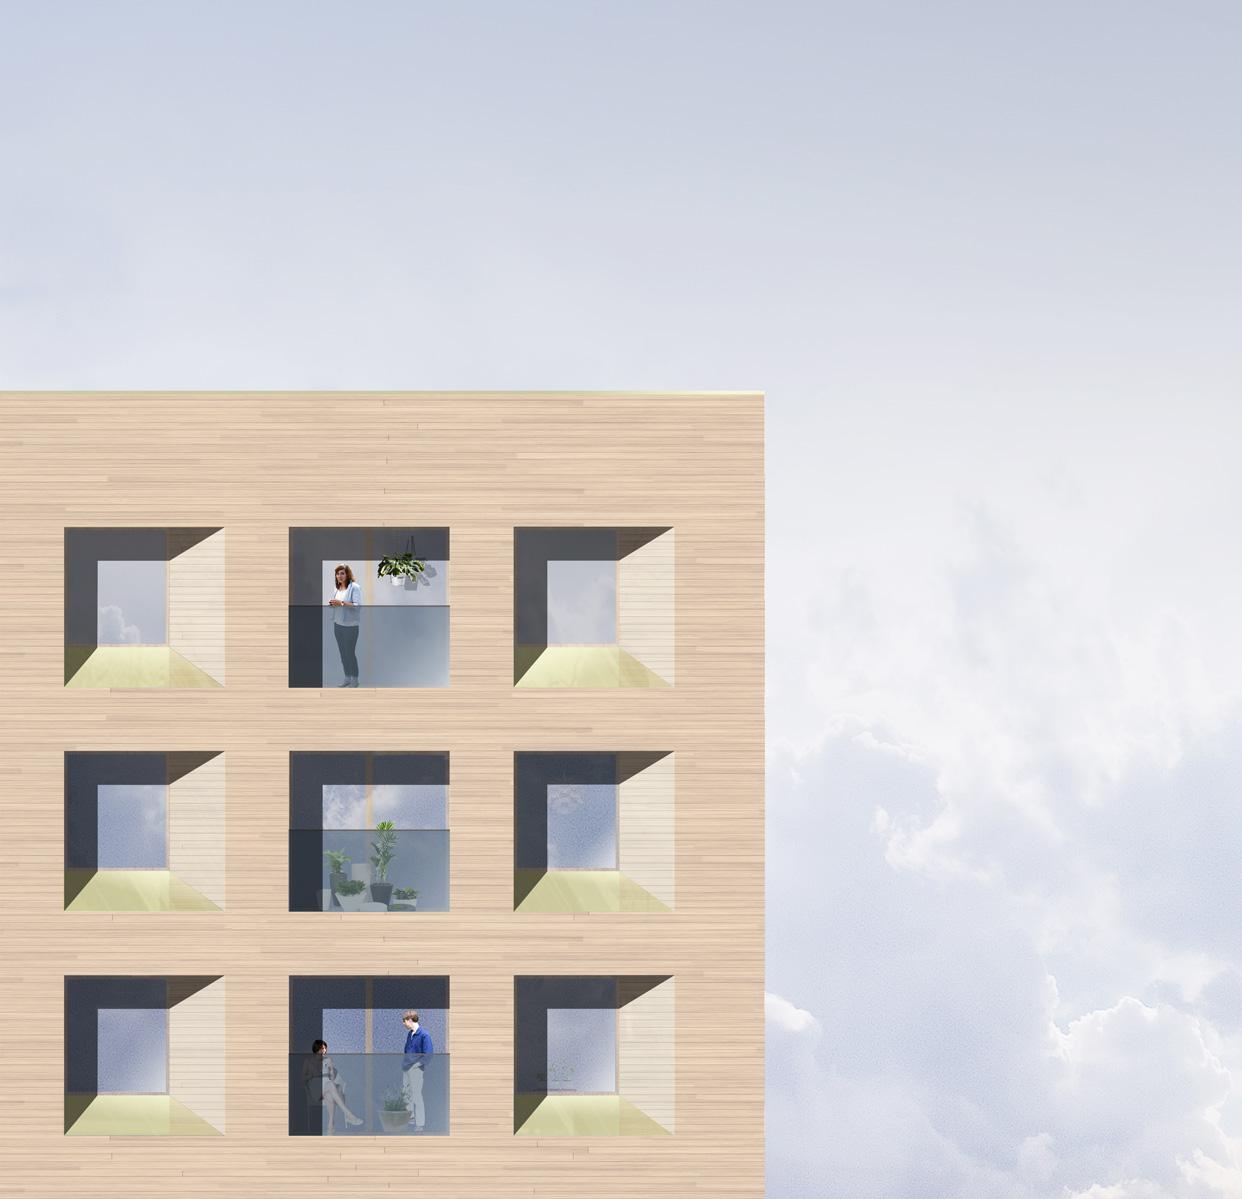 Plusenergihus_Norra_Djurgårdsstaden_Stockholm_Bostäder_Fasad_Varg_Arkitekter